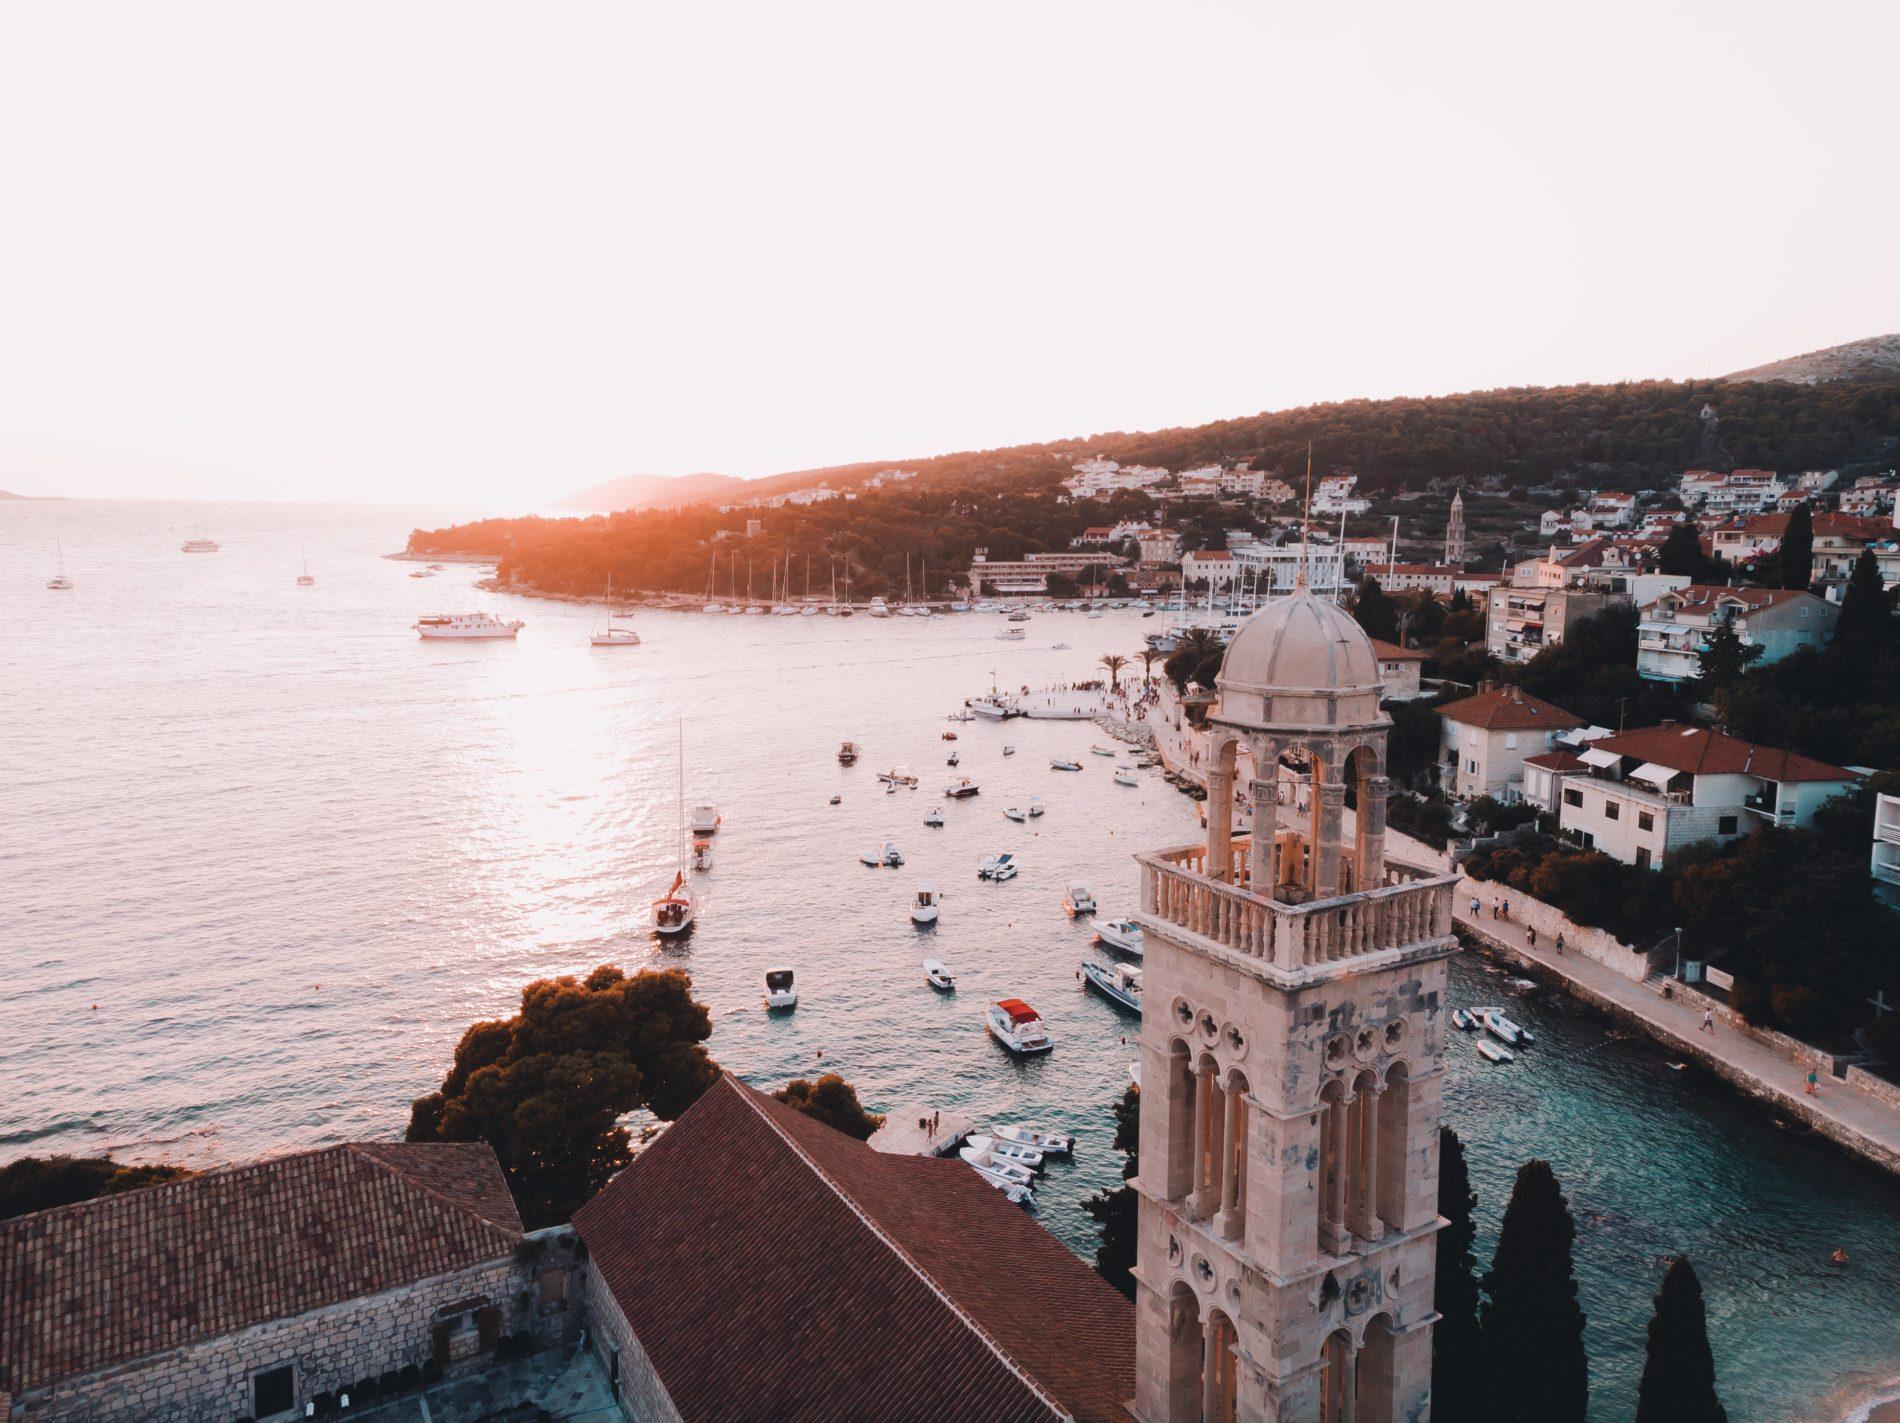 cody black Nm89MZvAR5I unsplash 1900x1423 - Станут ли туры в Хорватию дороже?